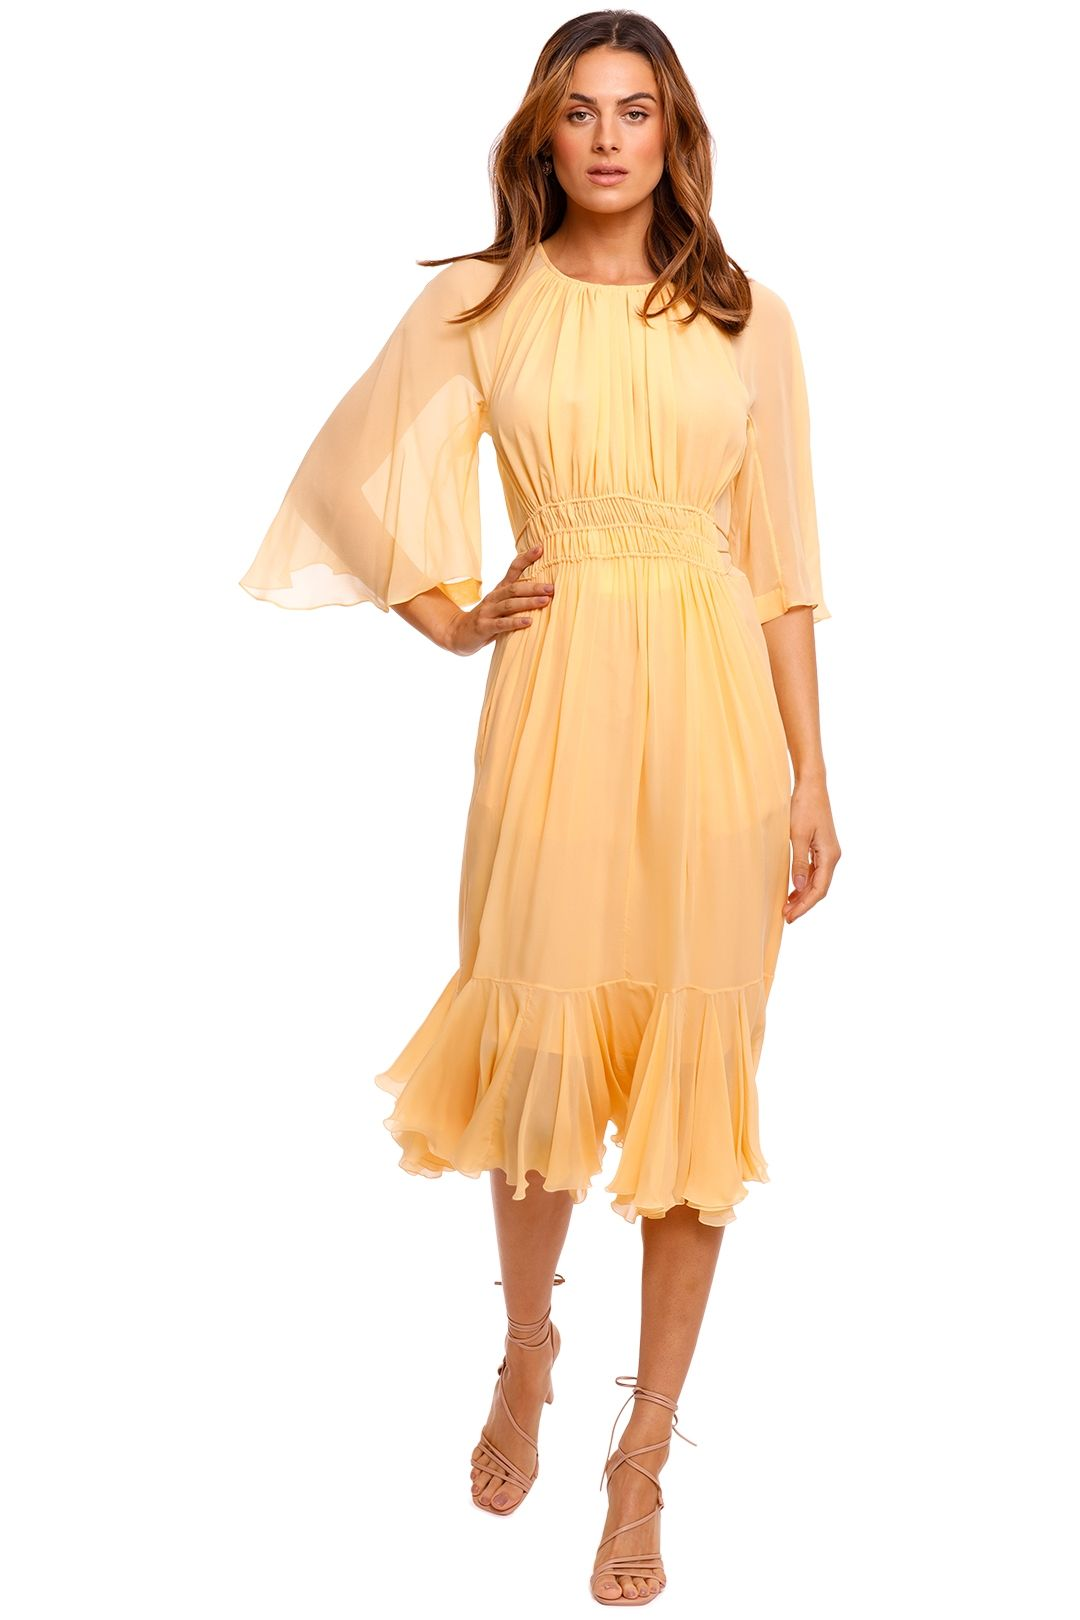 KITX Georgette Dress yellow